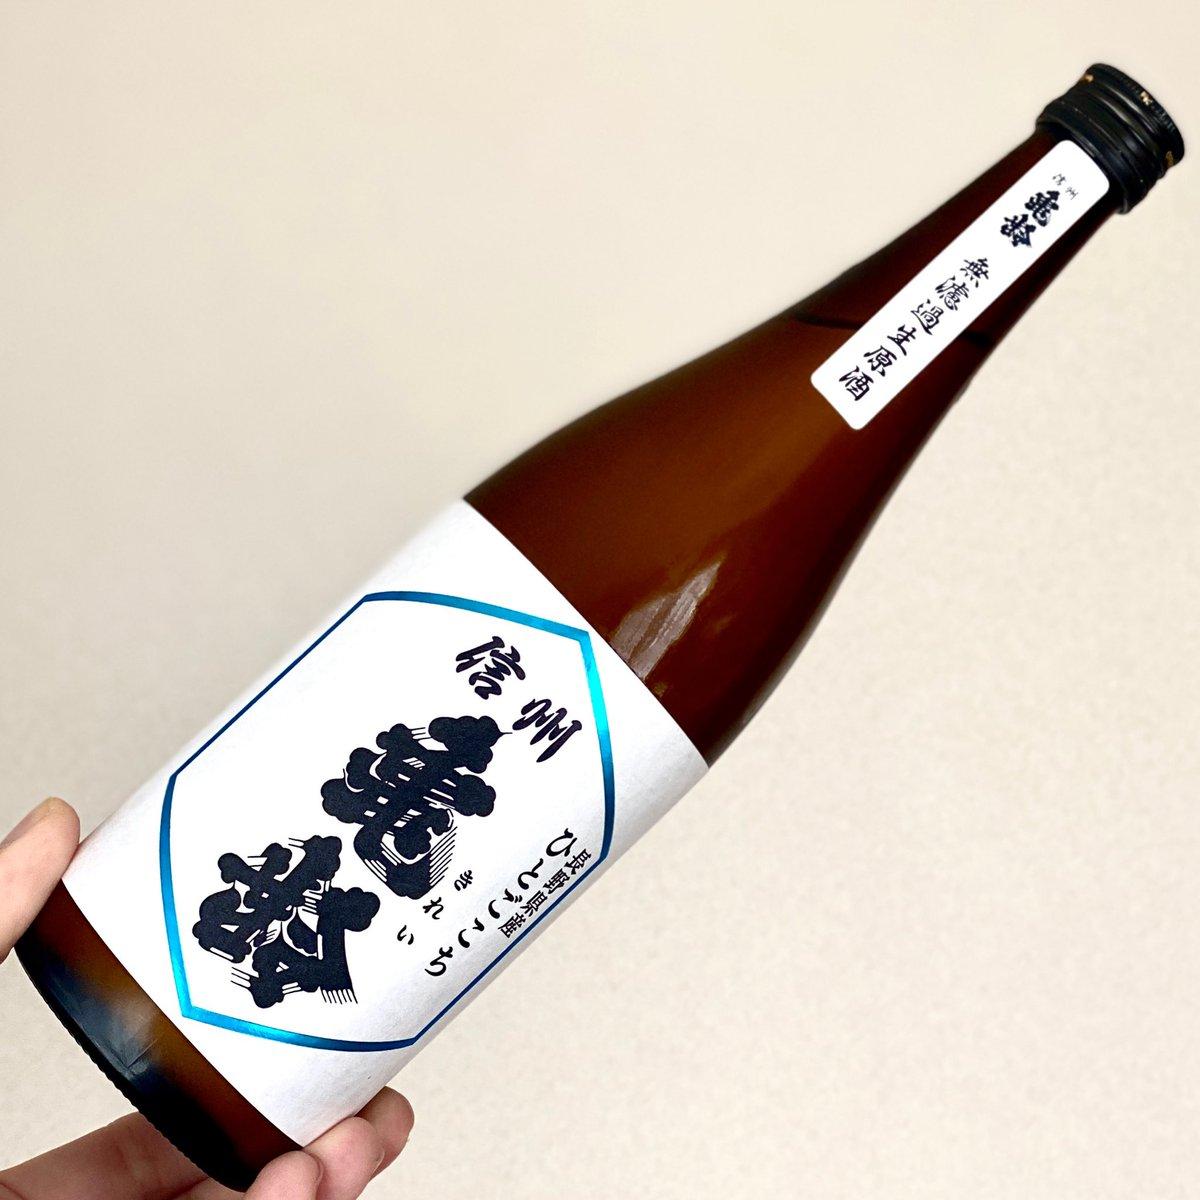 test ツイッターメディア - 信州亀齢 純米吟醸 ひとごこち  最近の人気の高まりも納得のうまさ!  詳しくはインスタで→ https://t.co/ZNH7BmdBNH  #信州亀齢 #日本酒 https://t.co/2zgLuhKL6H